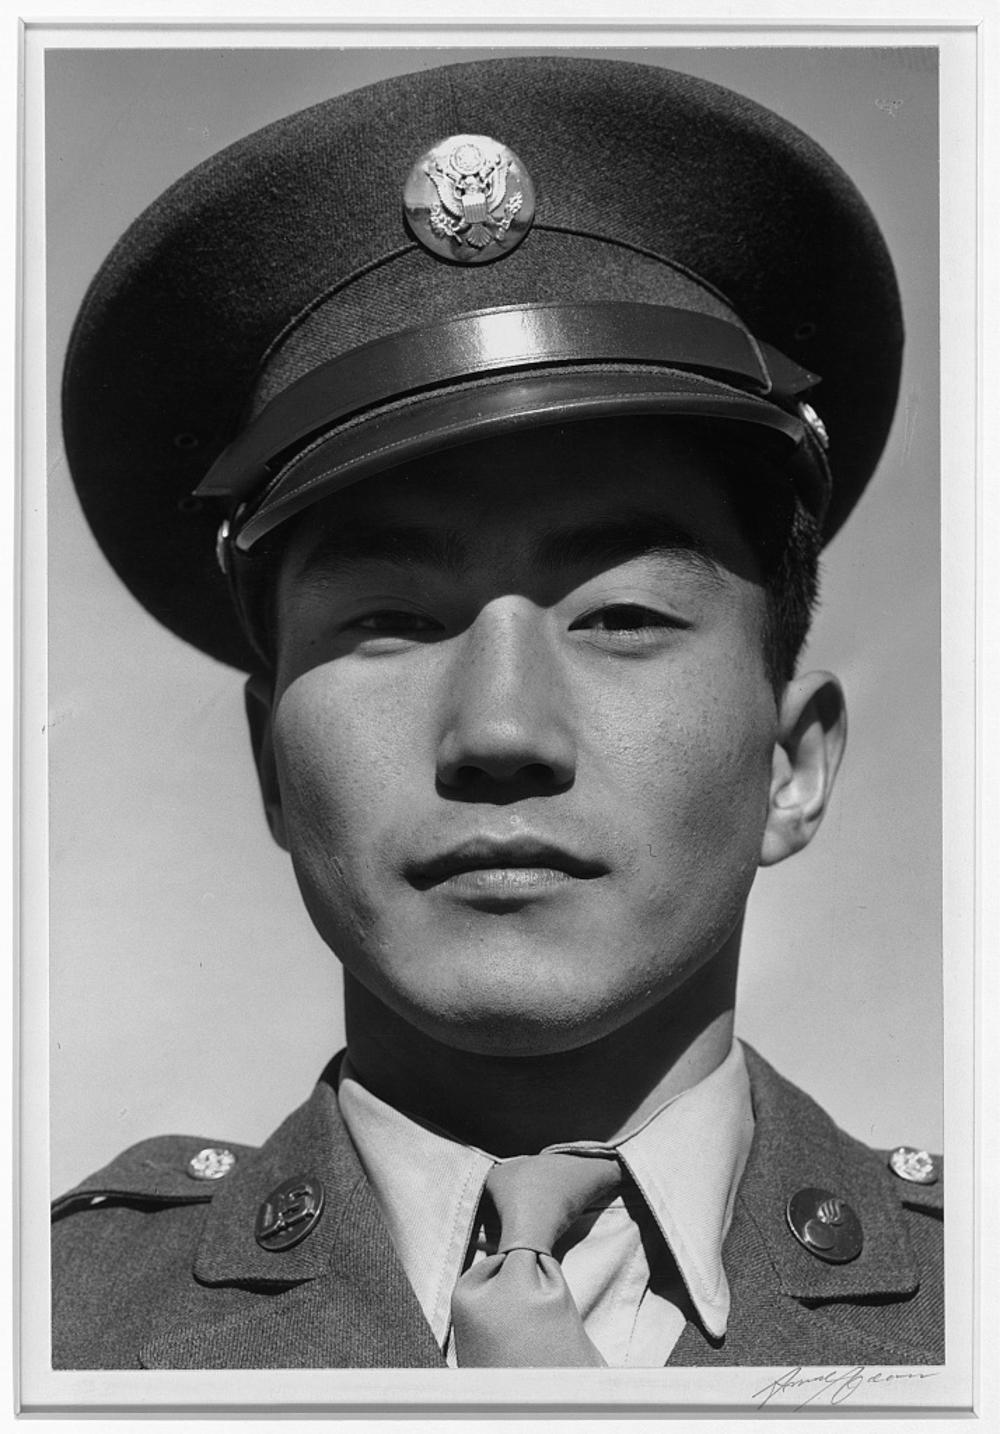 Corporal Jimmie Shohara, Manzanar Relocation Center, Calif.